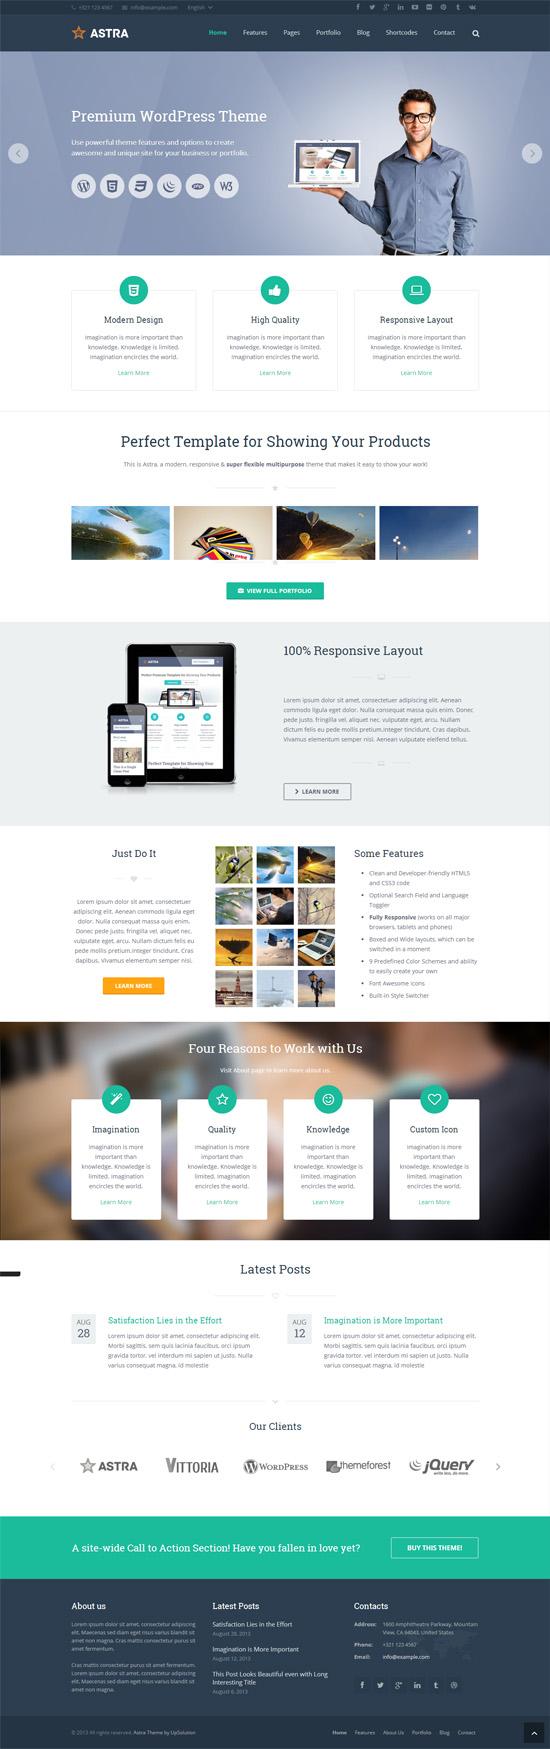 Astra – Retina Responsive WordPress Theme